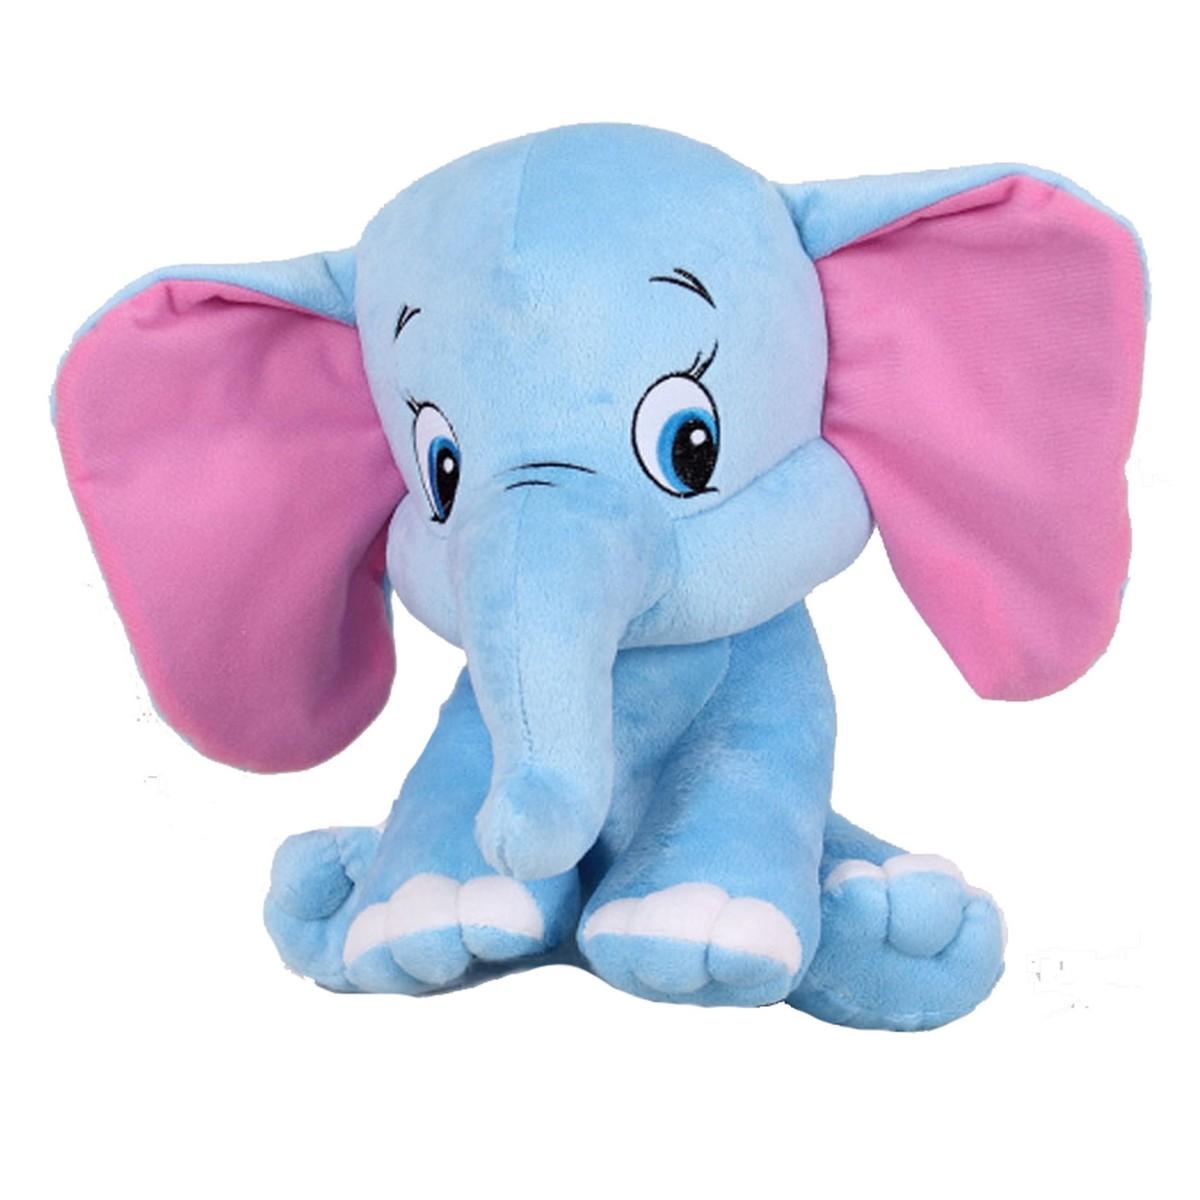 Слоненок на день святого валентина